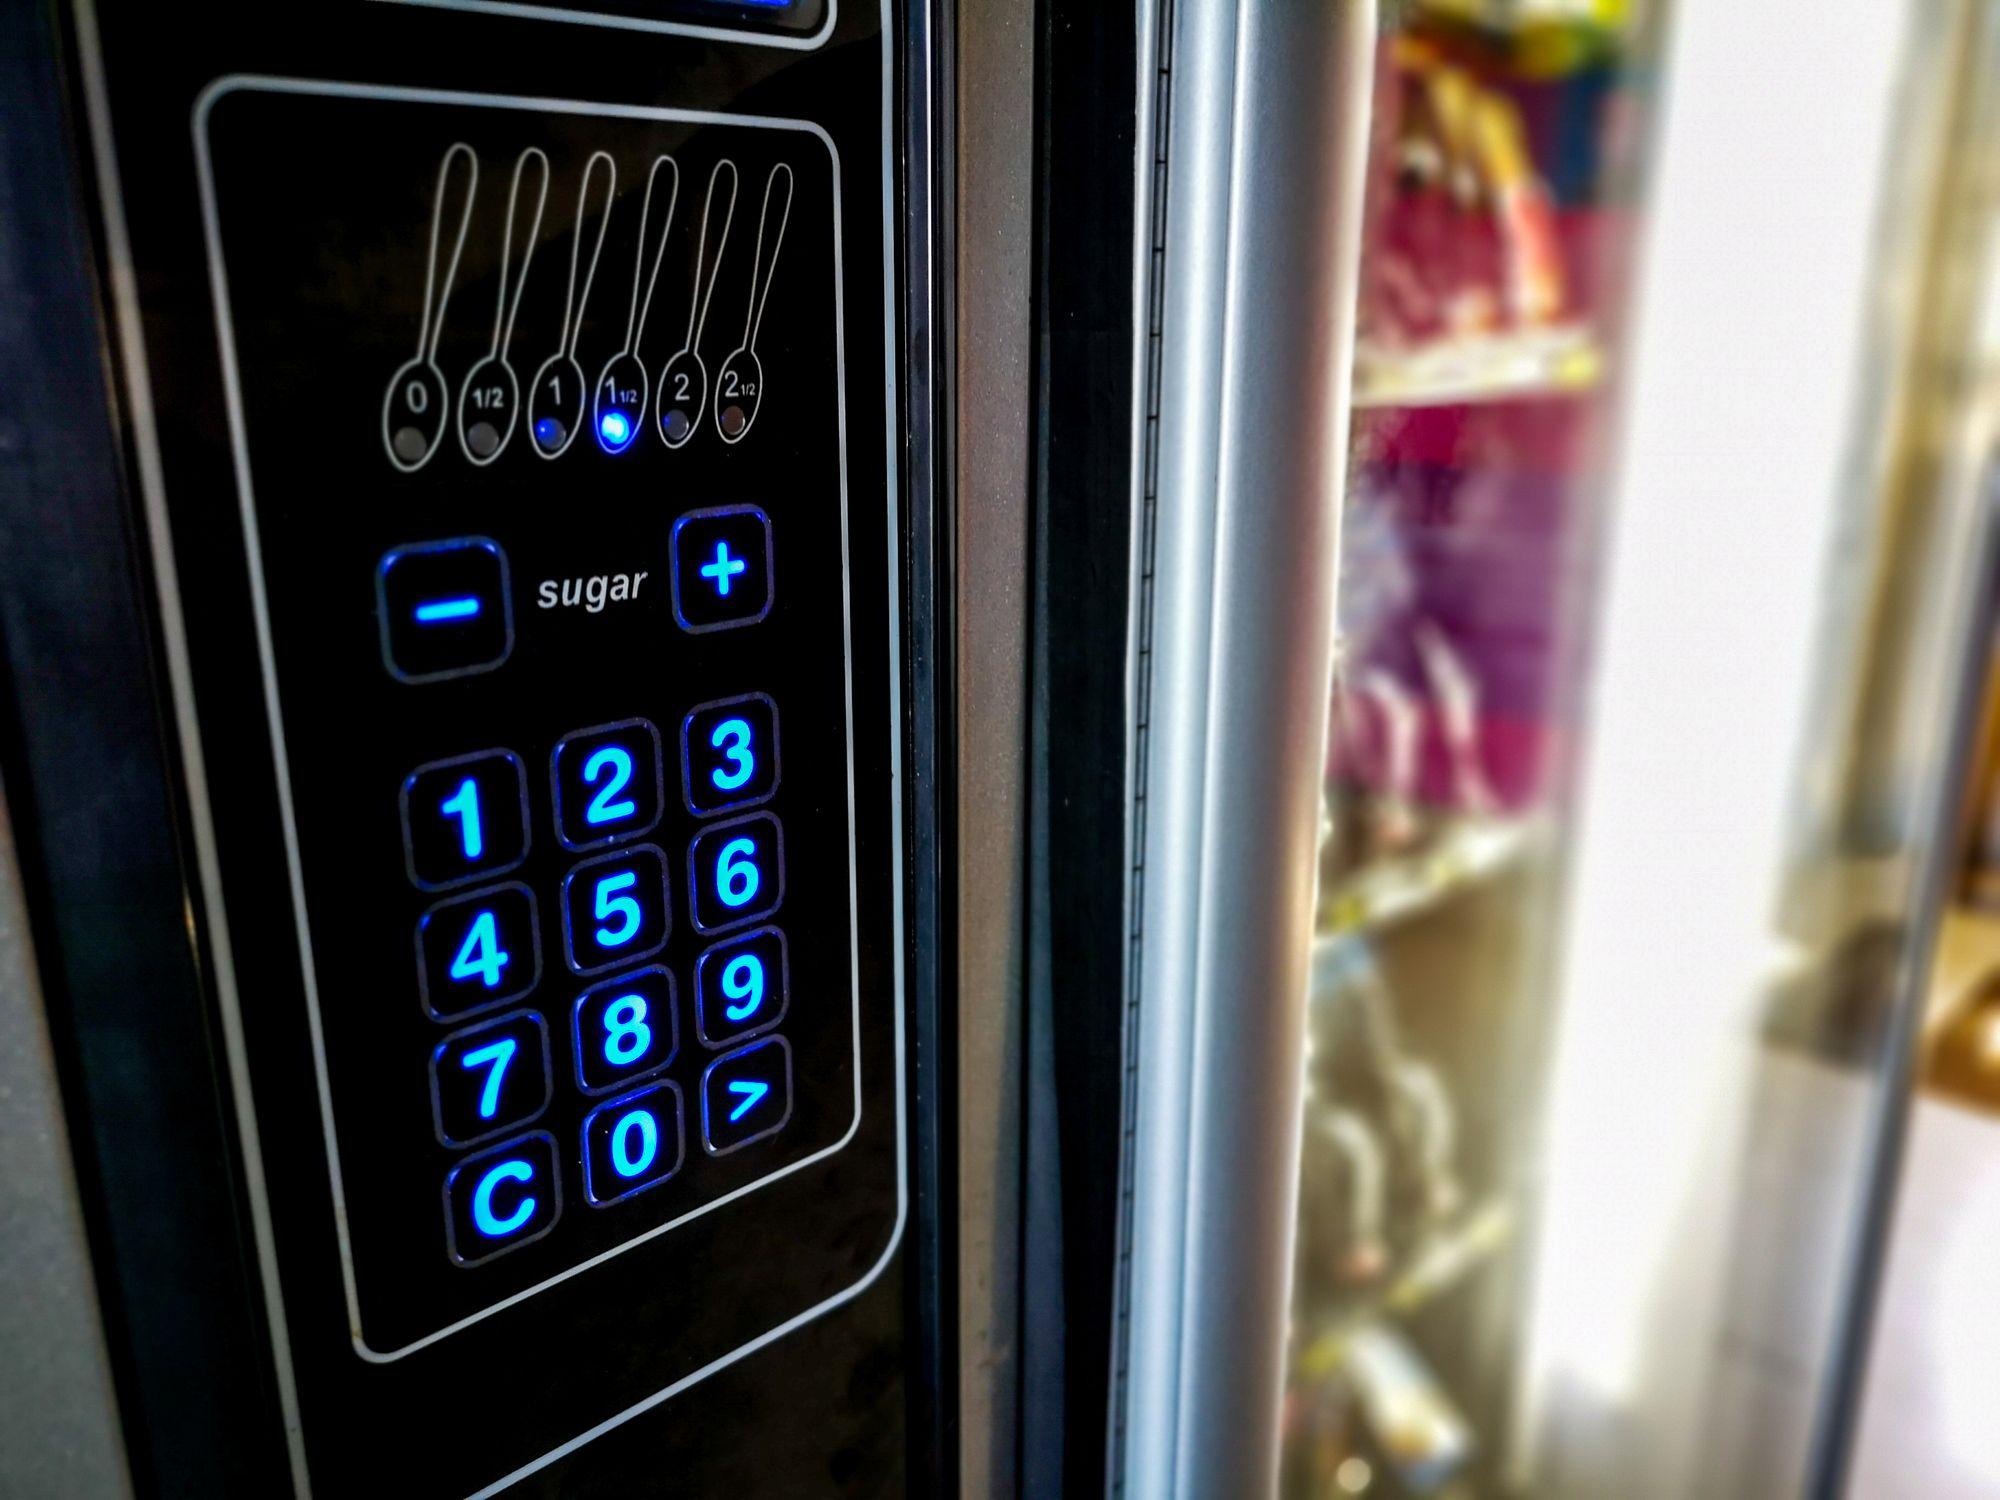 Vending-machine-IoT